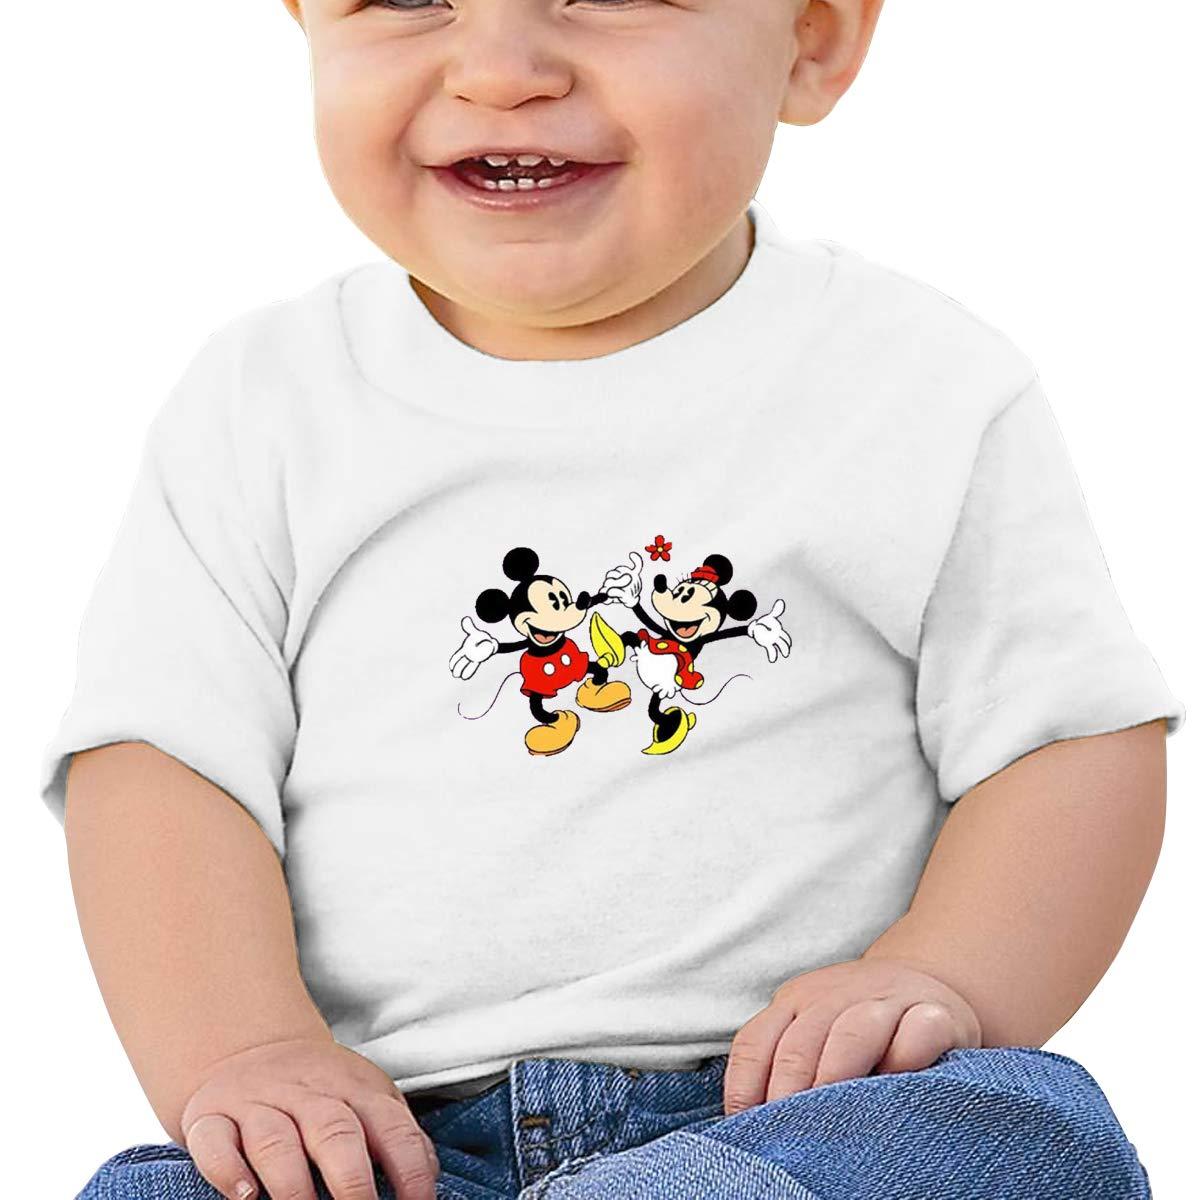 SakanpoMickey Mouse Dancing Toddler//Infant Short Sleeve Cotton T Shirts White